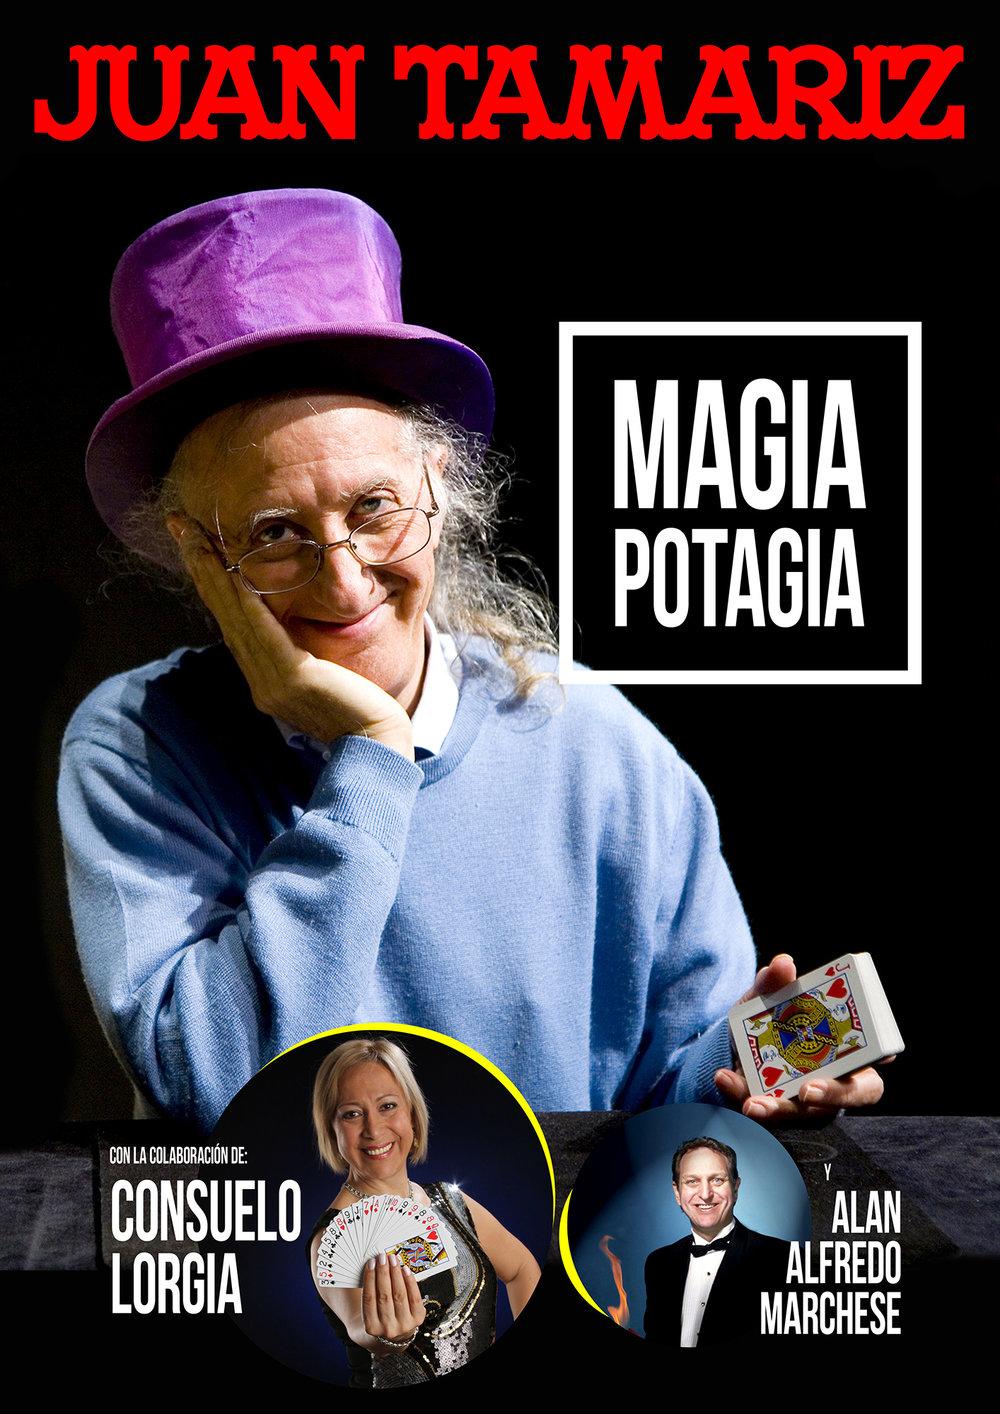 magia-potagia-tamariz-valladolid.jpg